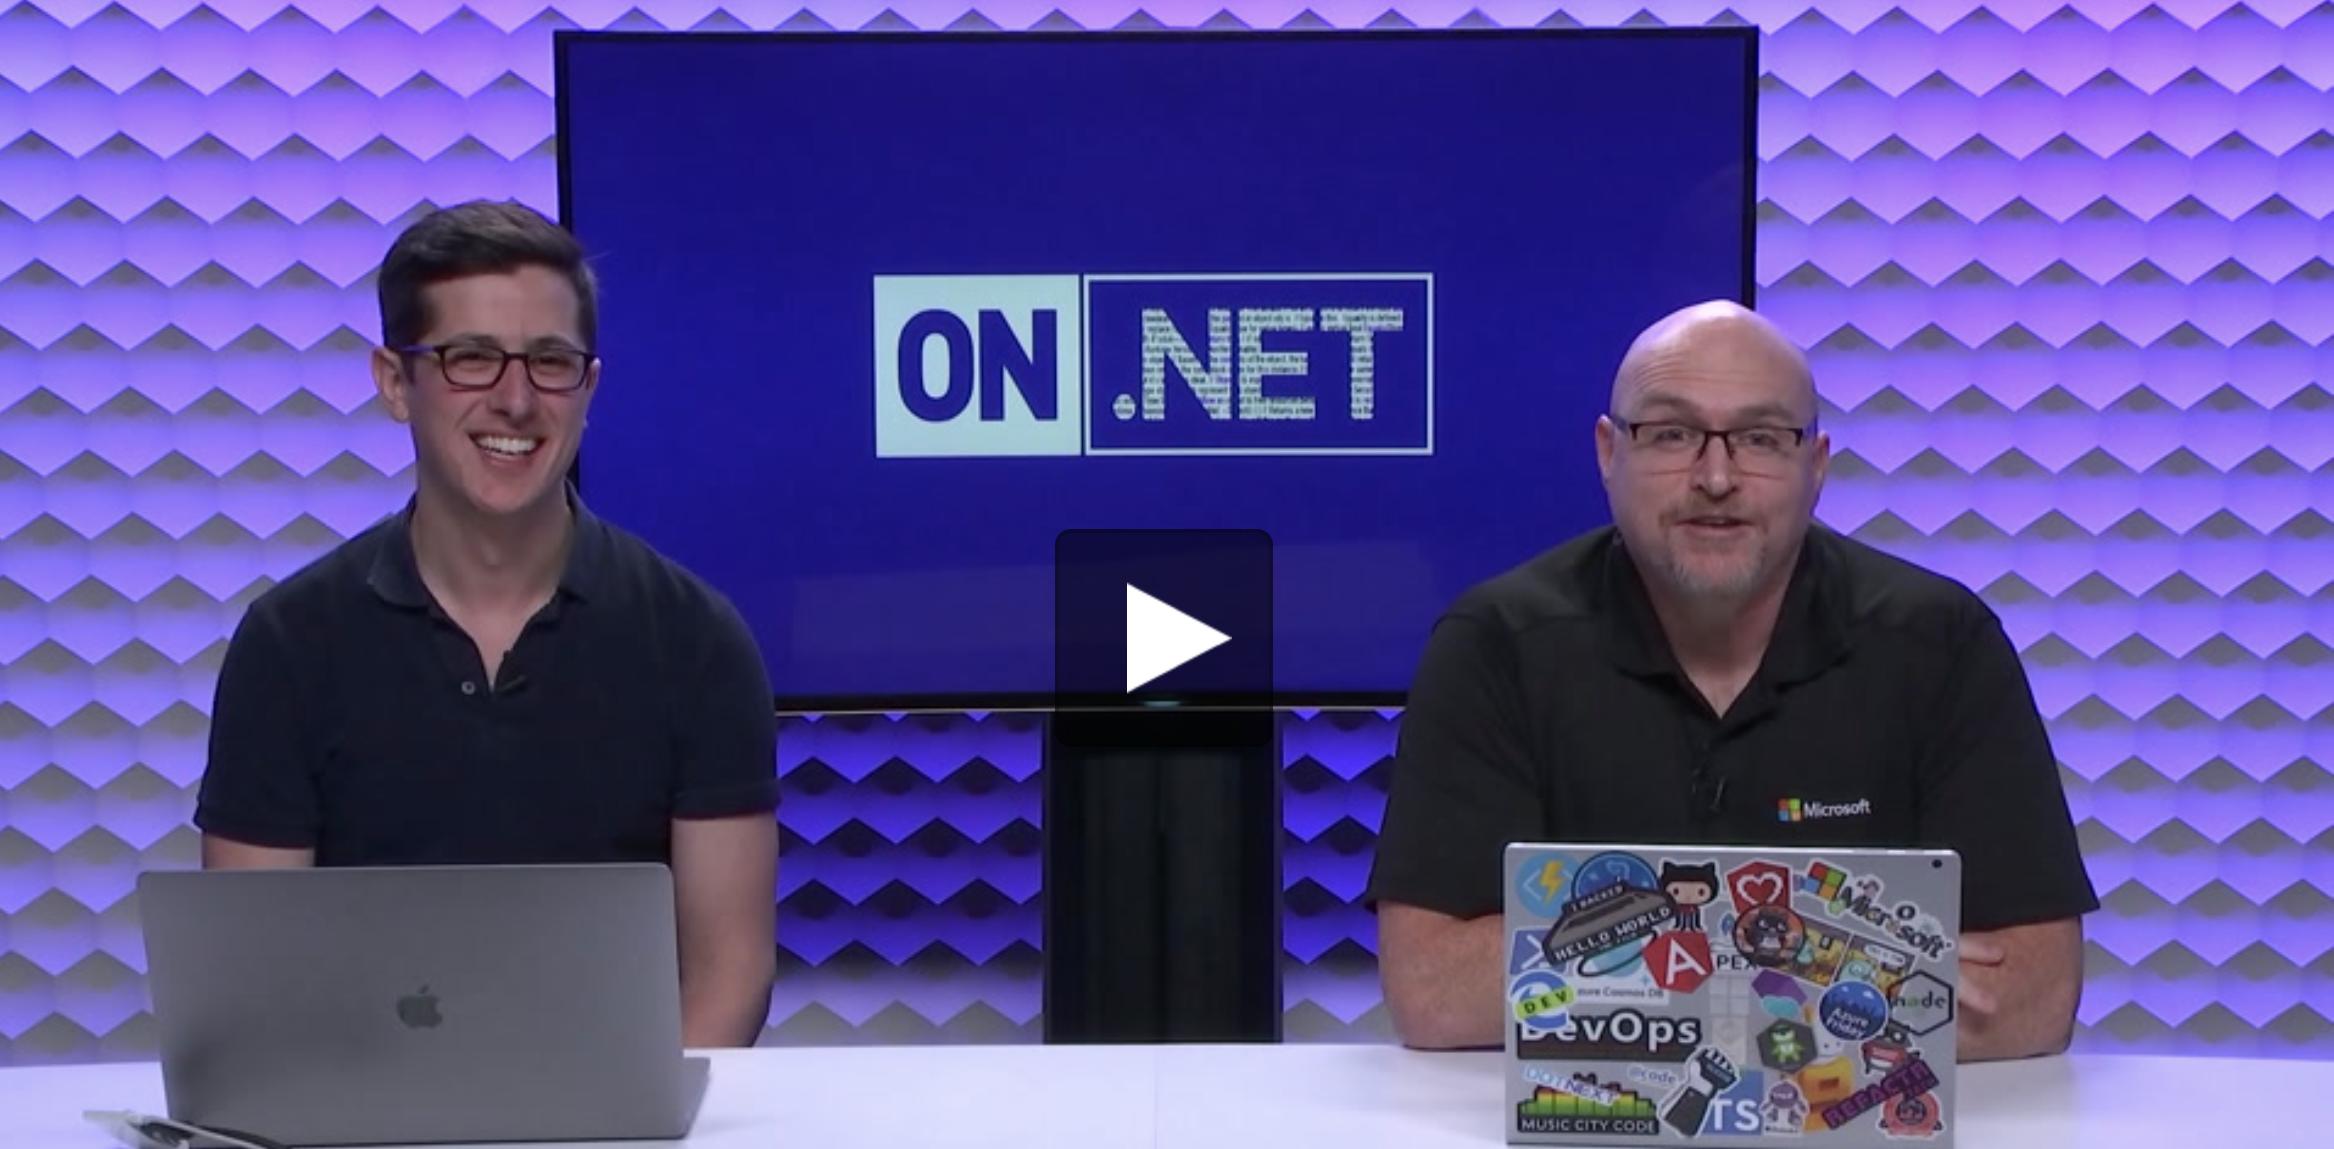 On .NET Show